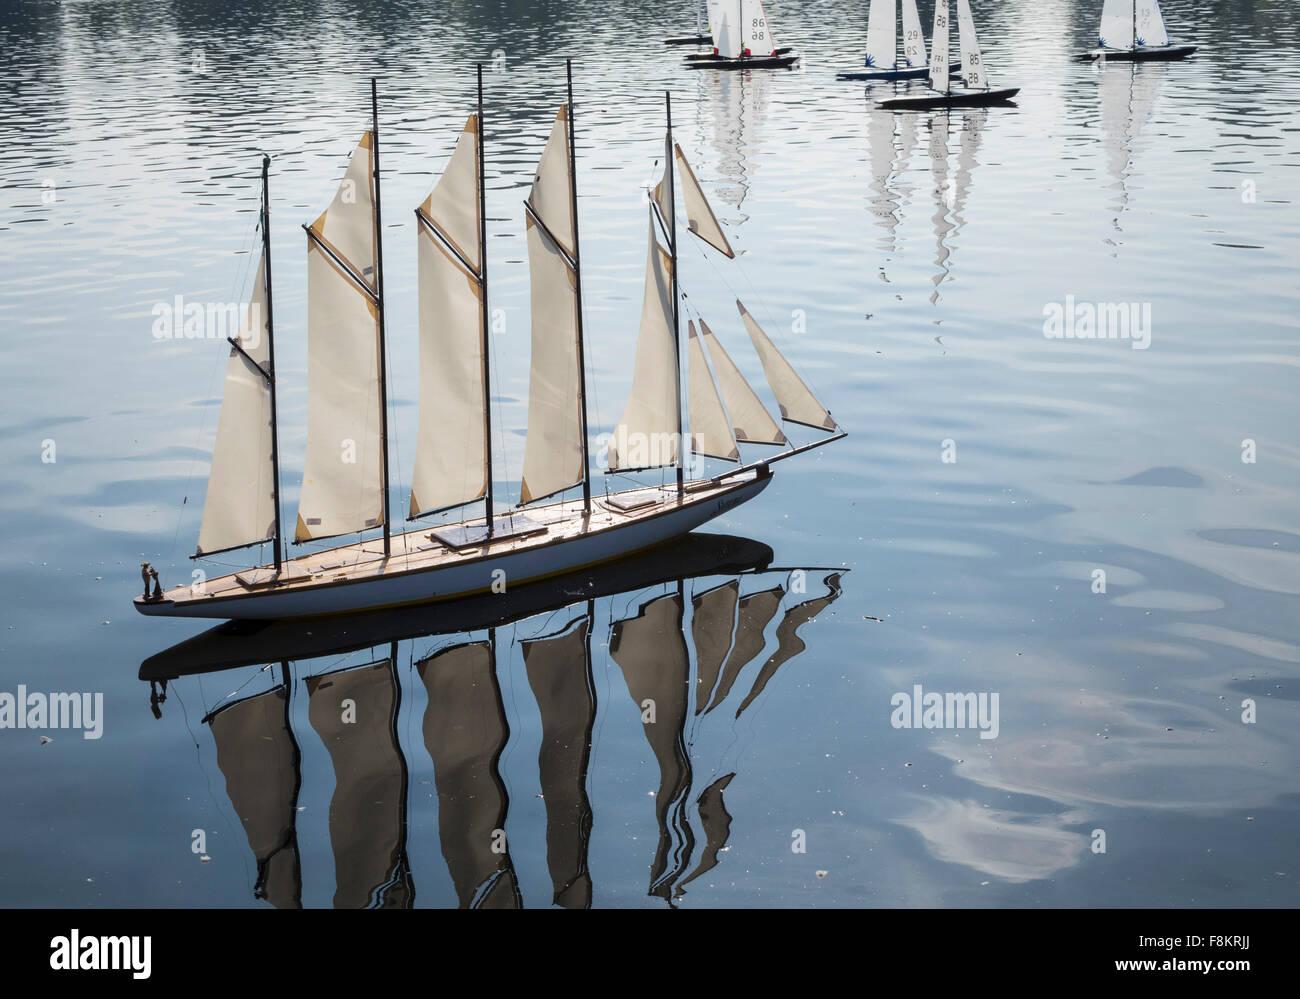 Model yacht stockfotos bilder alamy